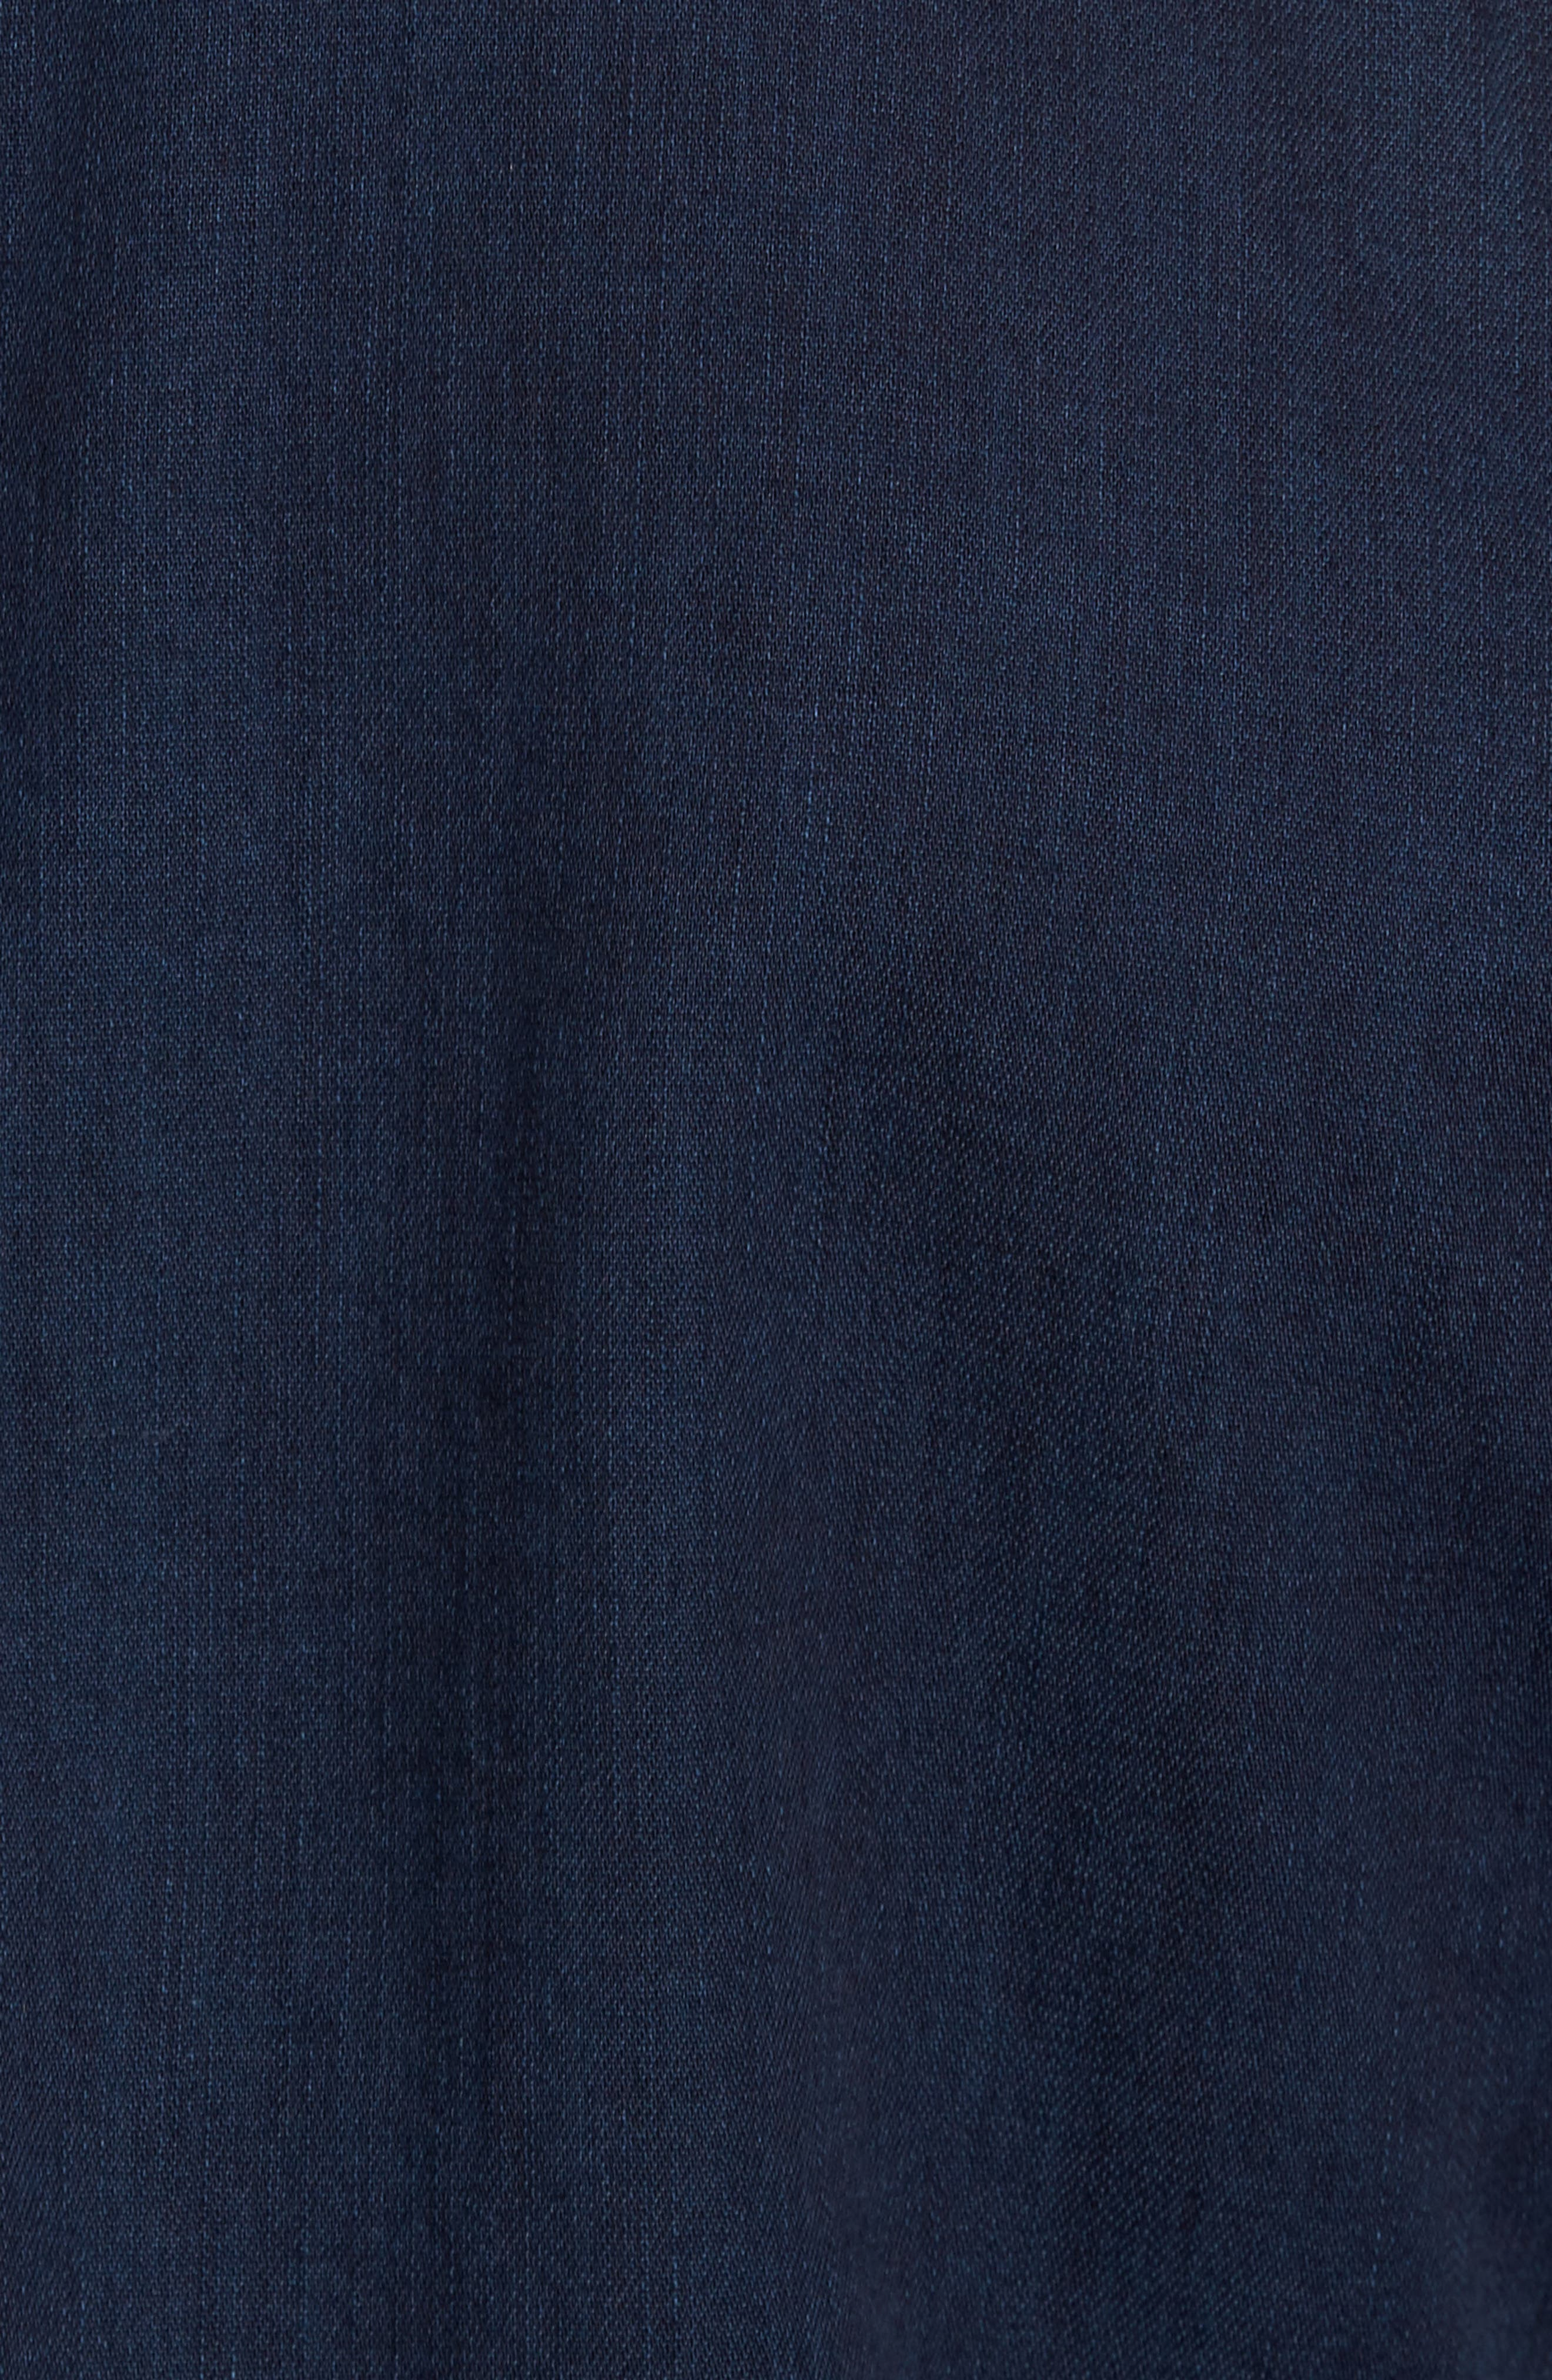 Pocketless Western Denim Shirt,                             Alternate thumbnail 5, color,